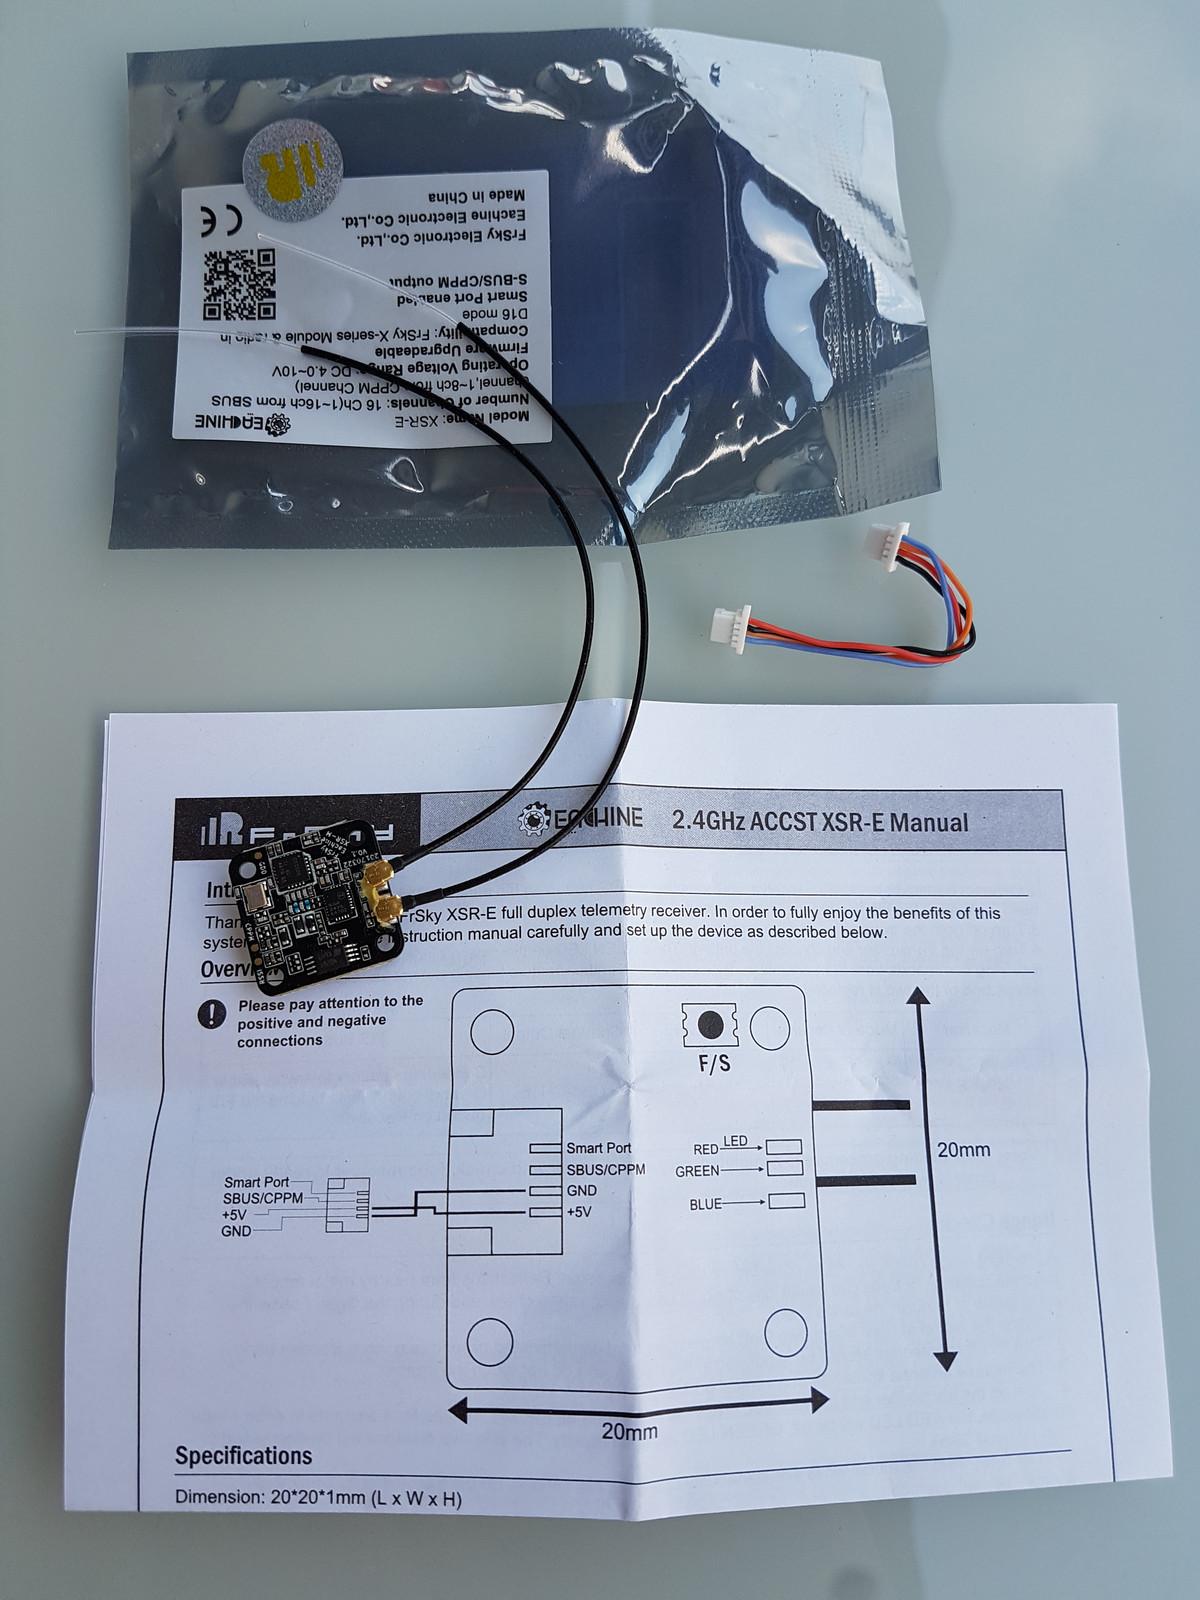 Review of Frsky XSR-M / EACHINE XSR-E - 15x15m D16 2.4G 16CH ACCST ...